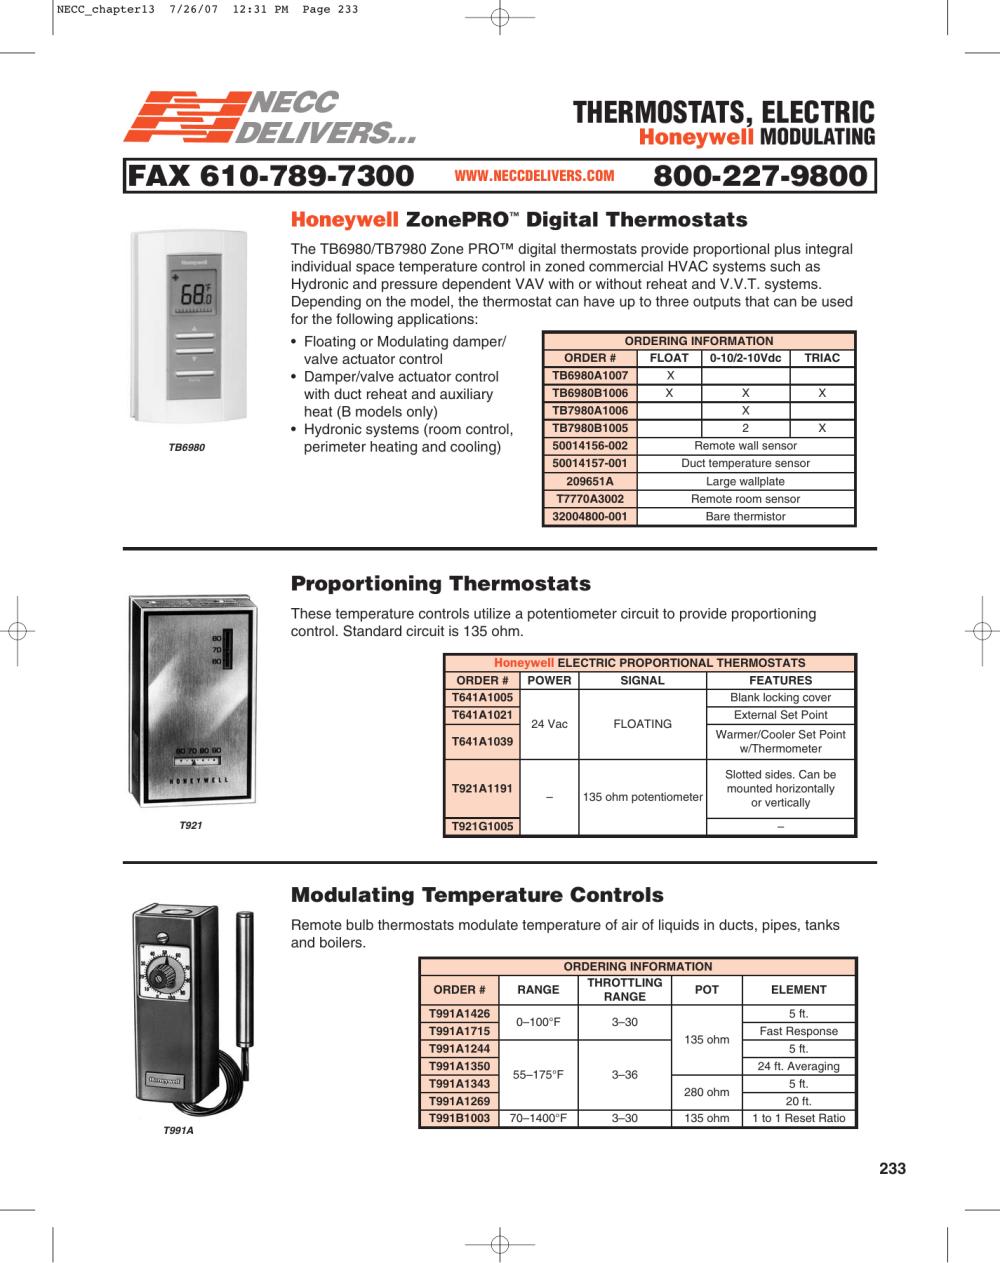 medium resolution of 62 0238 1 tb6980 tb7980 zonepro thermostat necc